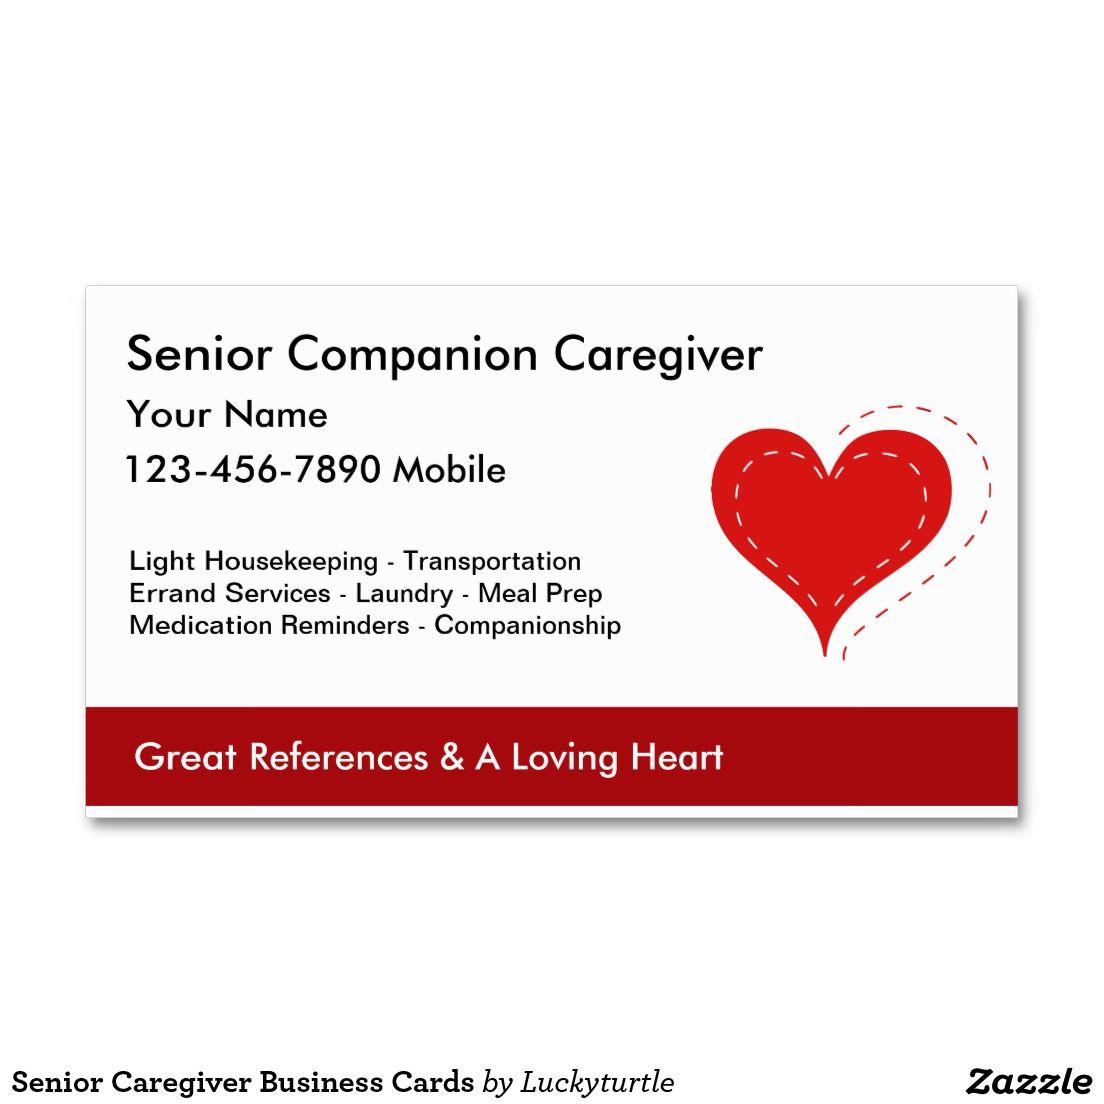 Senior Caregiver Business Cards | Business cards and Business